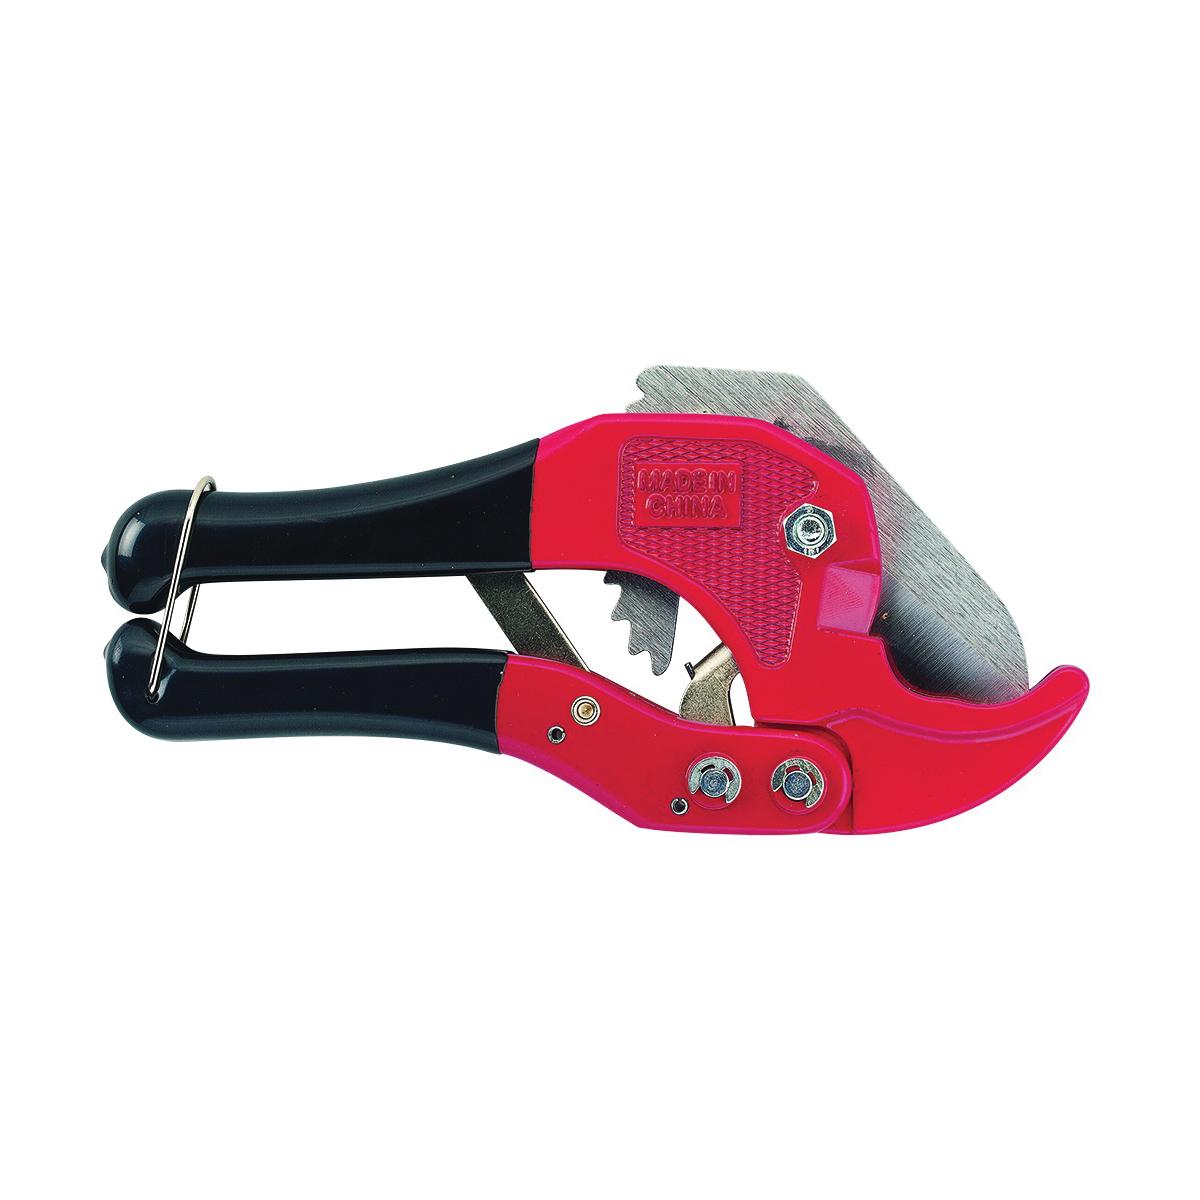 Picture of Orbit 26085 PVC Cutting Tool, 1 in Max Pipe/Tube Dia, 1/2 in Mini Pipe/Tube Dia, Steel Blade, Plastic Pipe/Tube